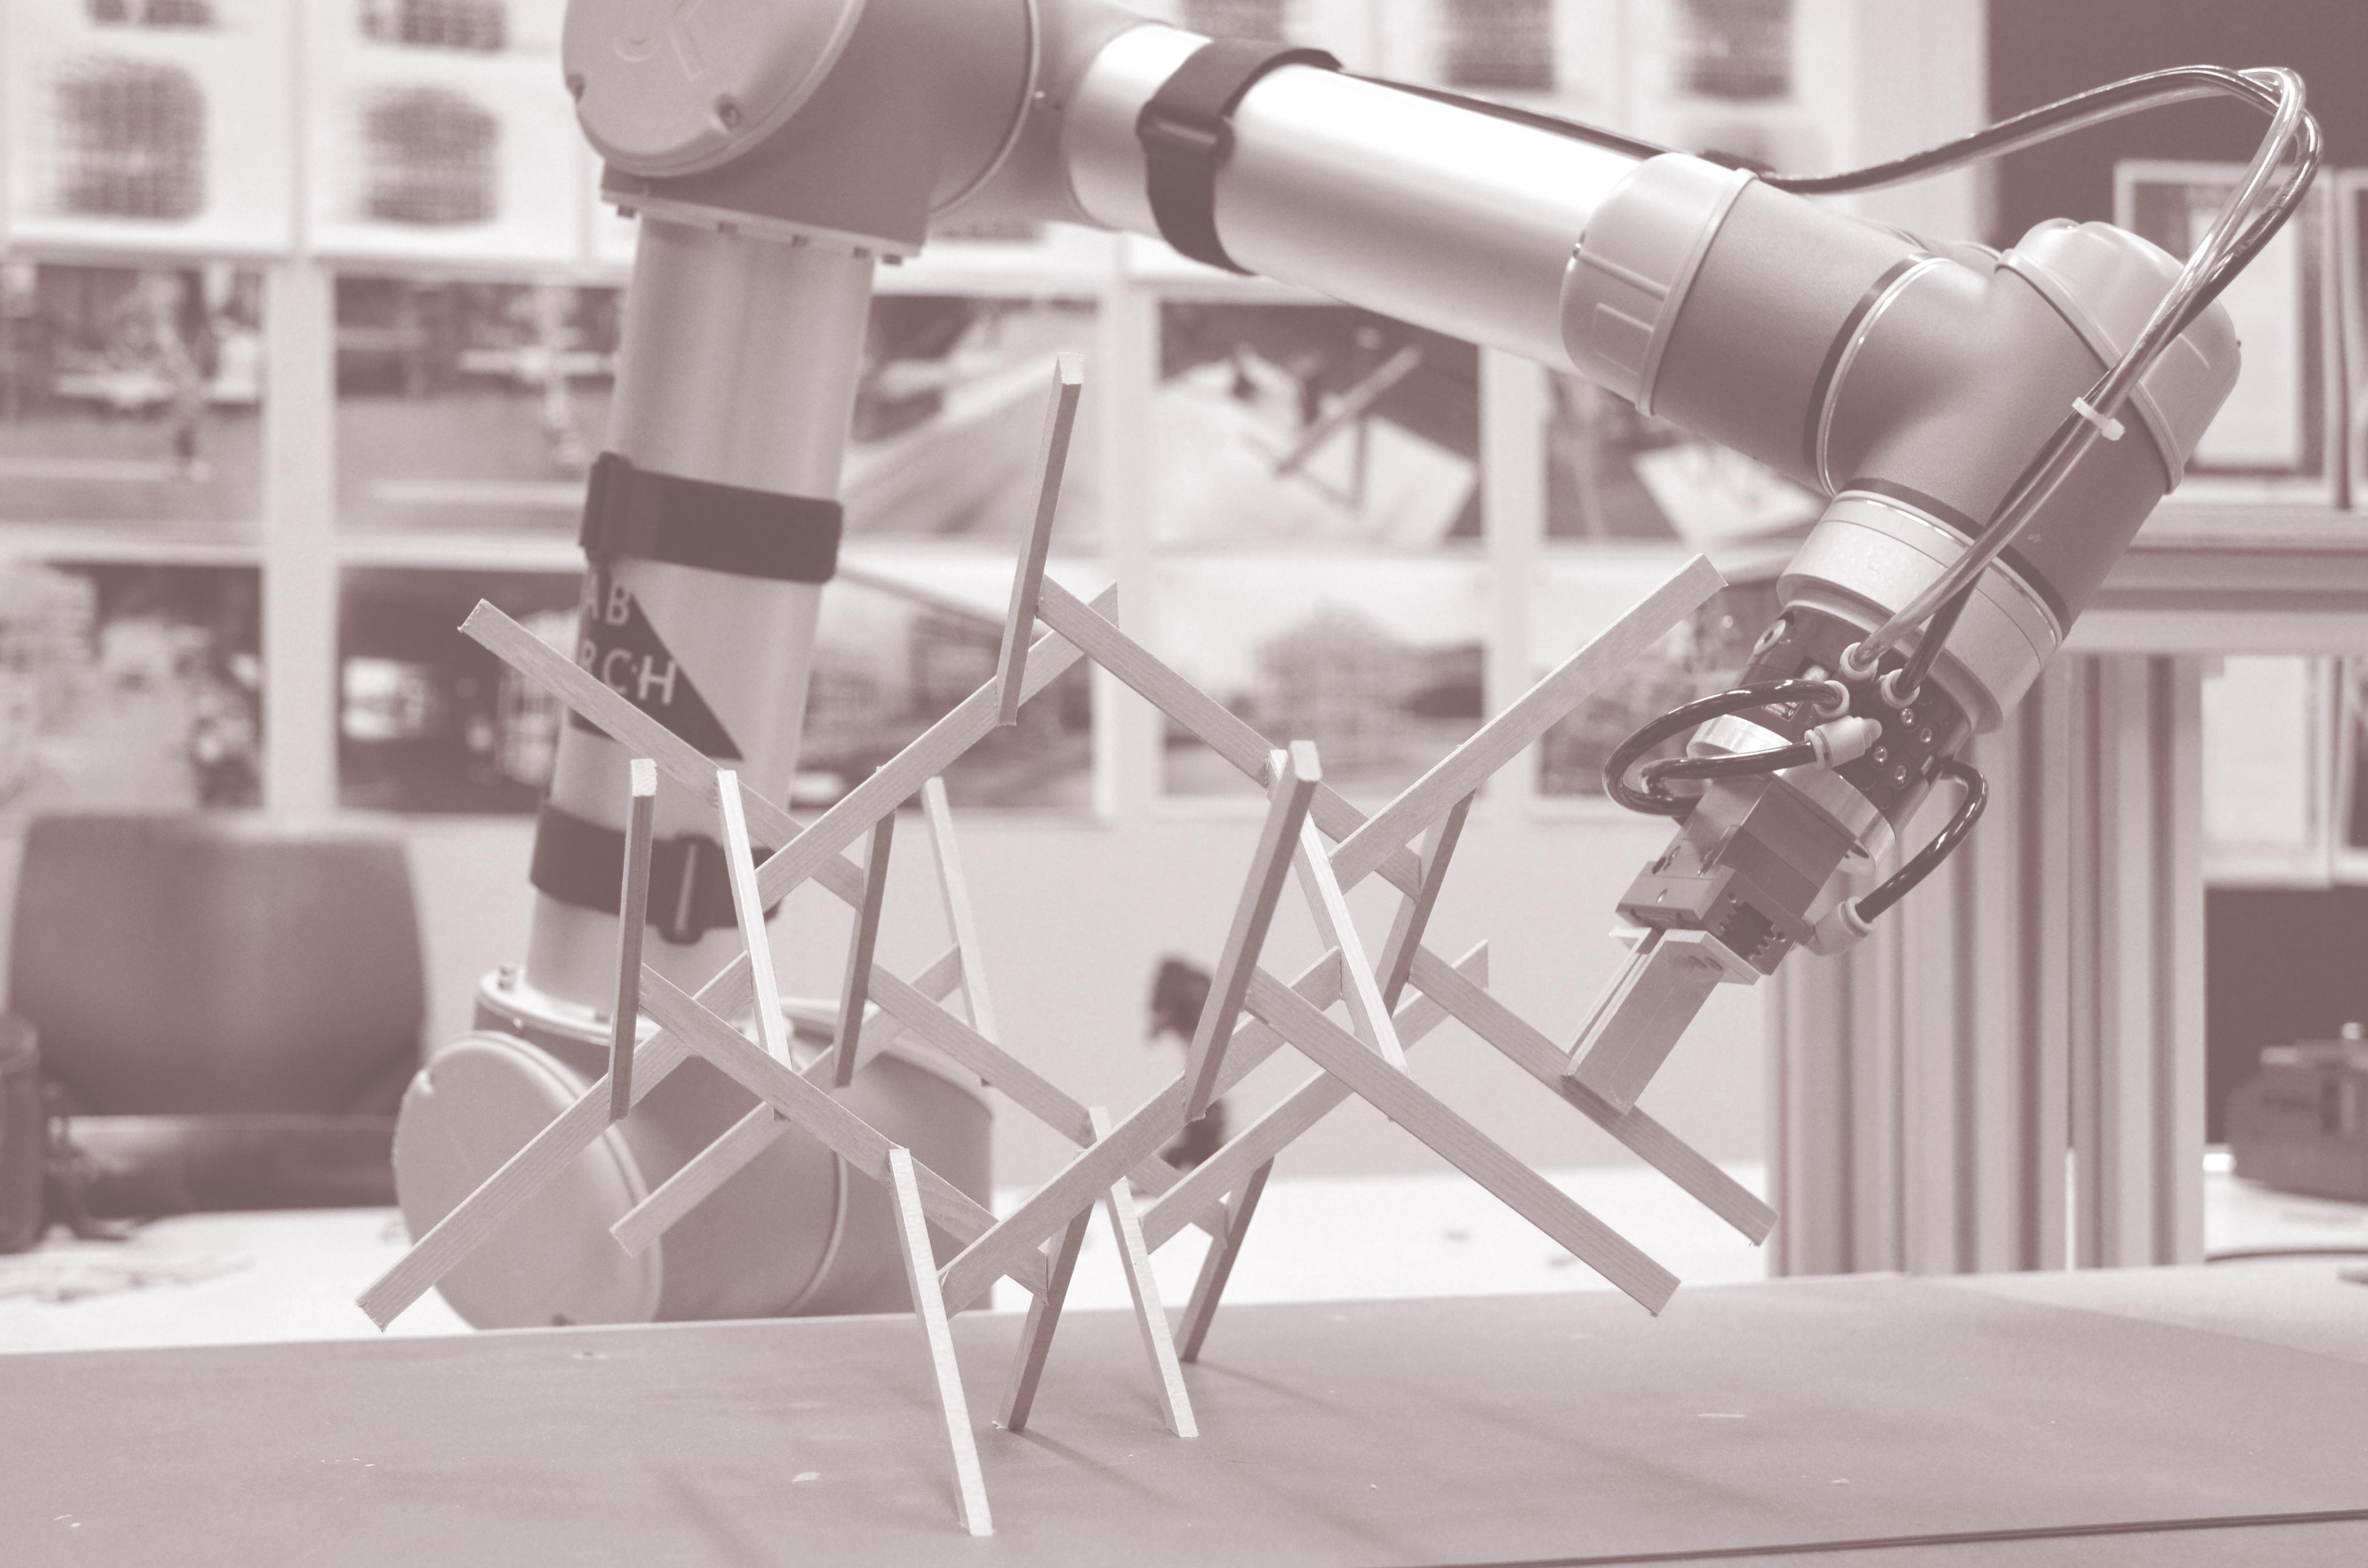 130417_164_GR02_RobotFabrication_LP_237_PR